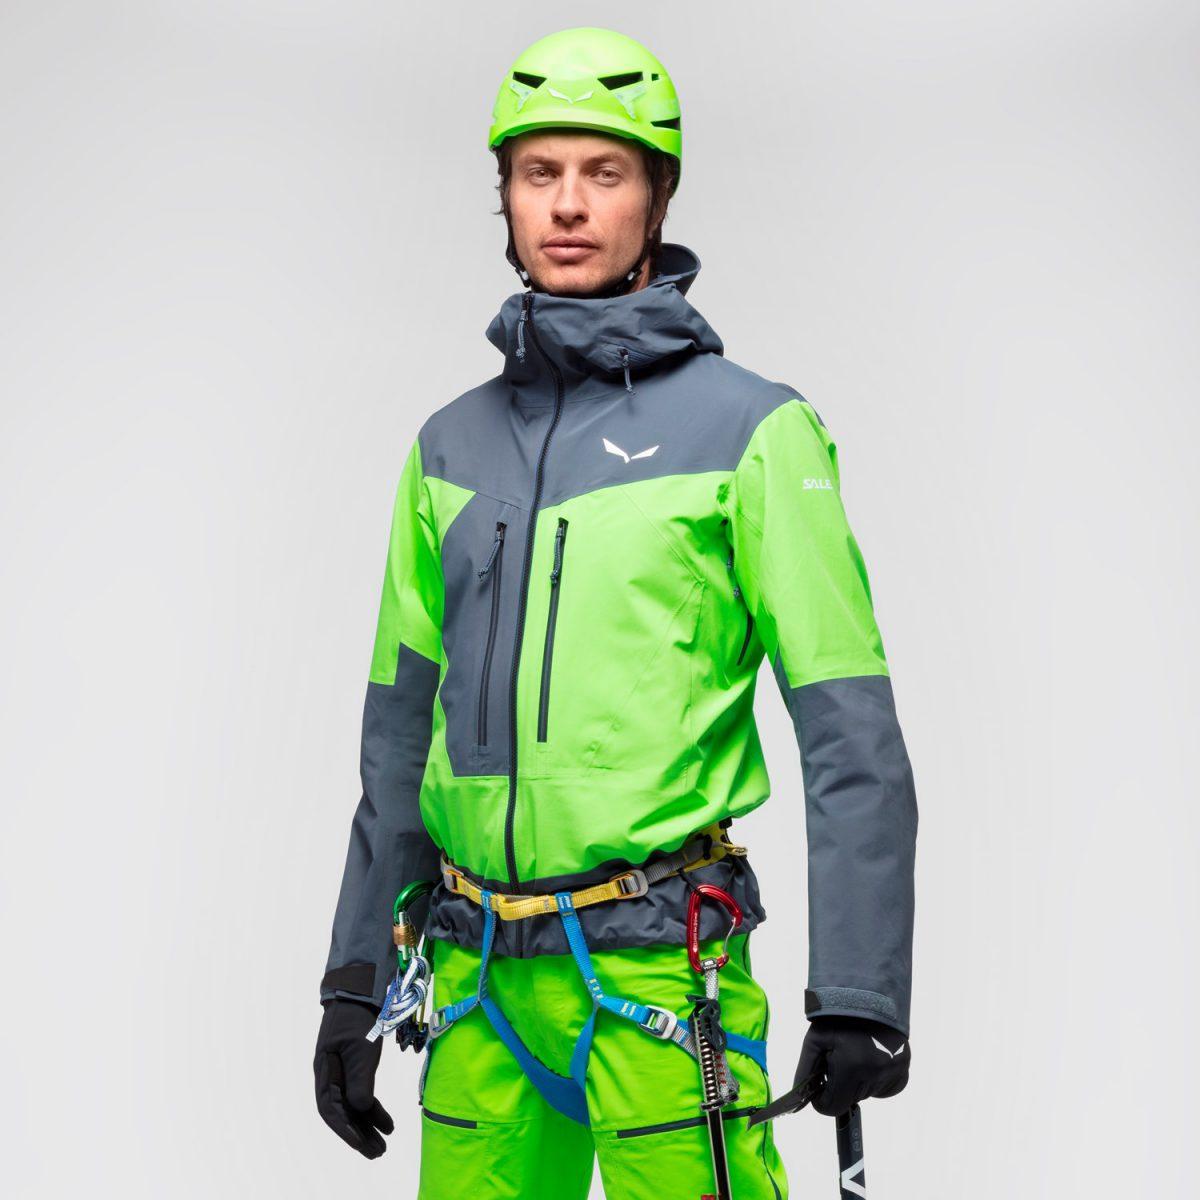 ORTLES 3 GORE-TEX PRO waterproof man jacket waterproof green herness compatible